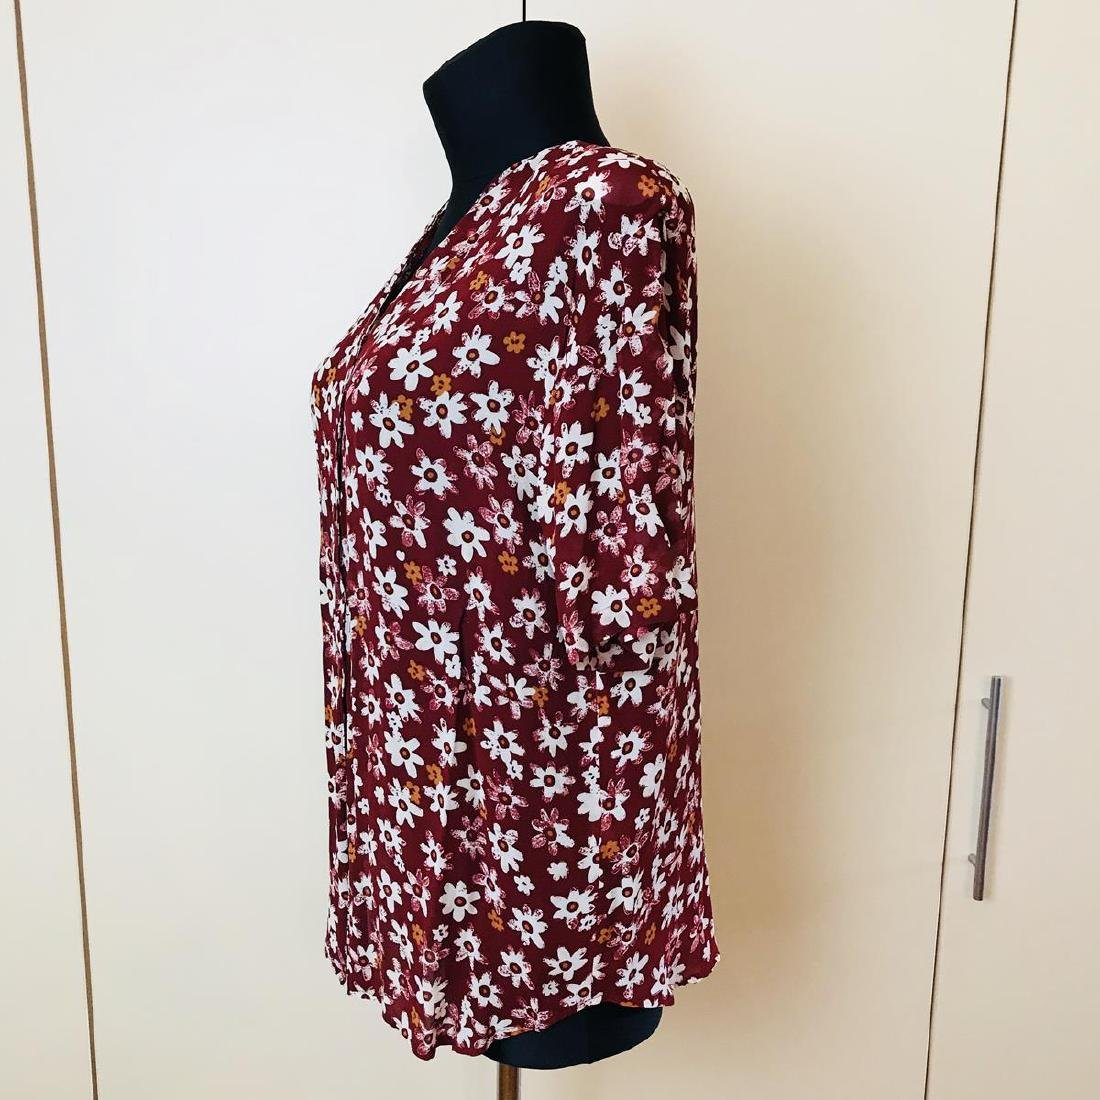 Vintage Women's Bellissima Designer Blouse Shirt Top - 4